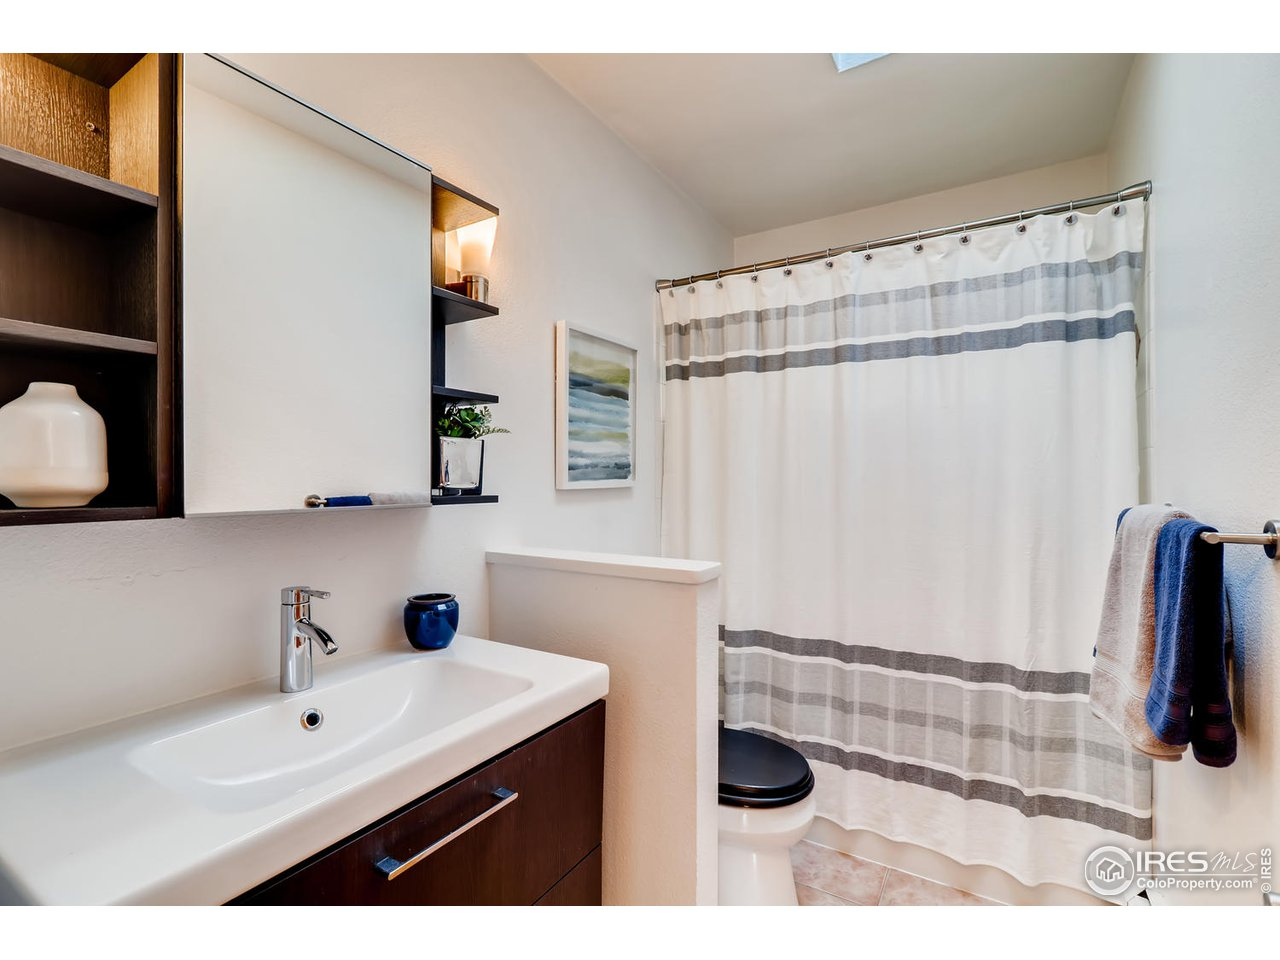 Full bath w/ new vanity